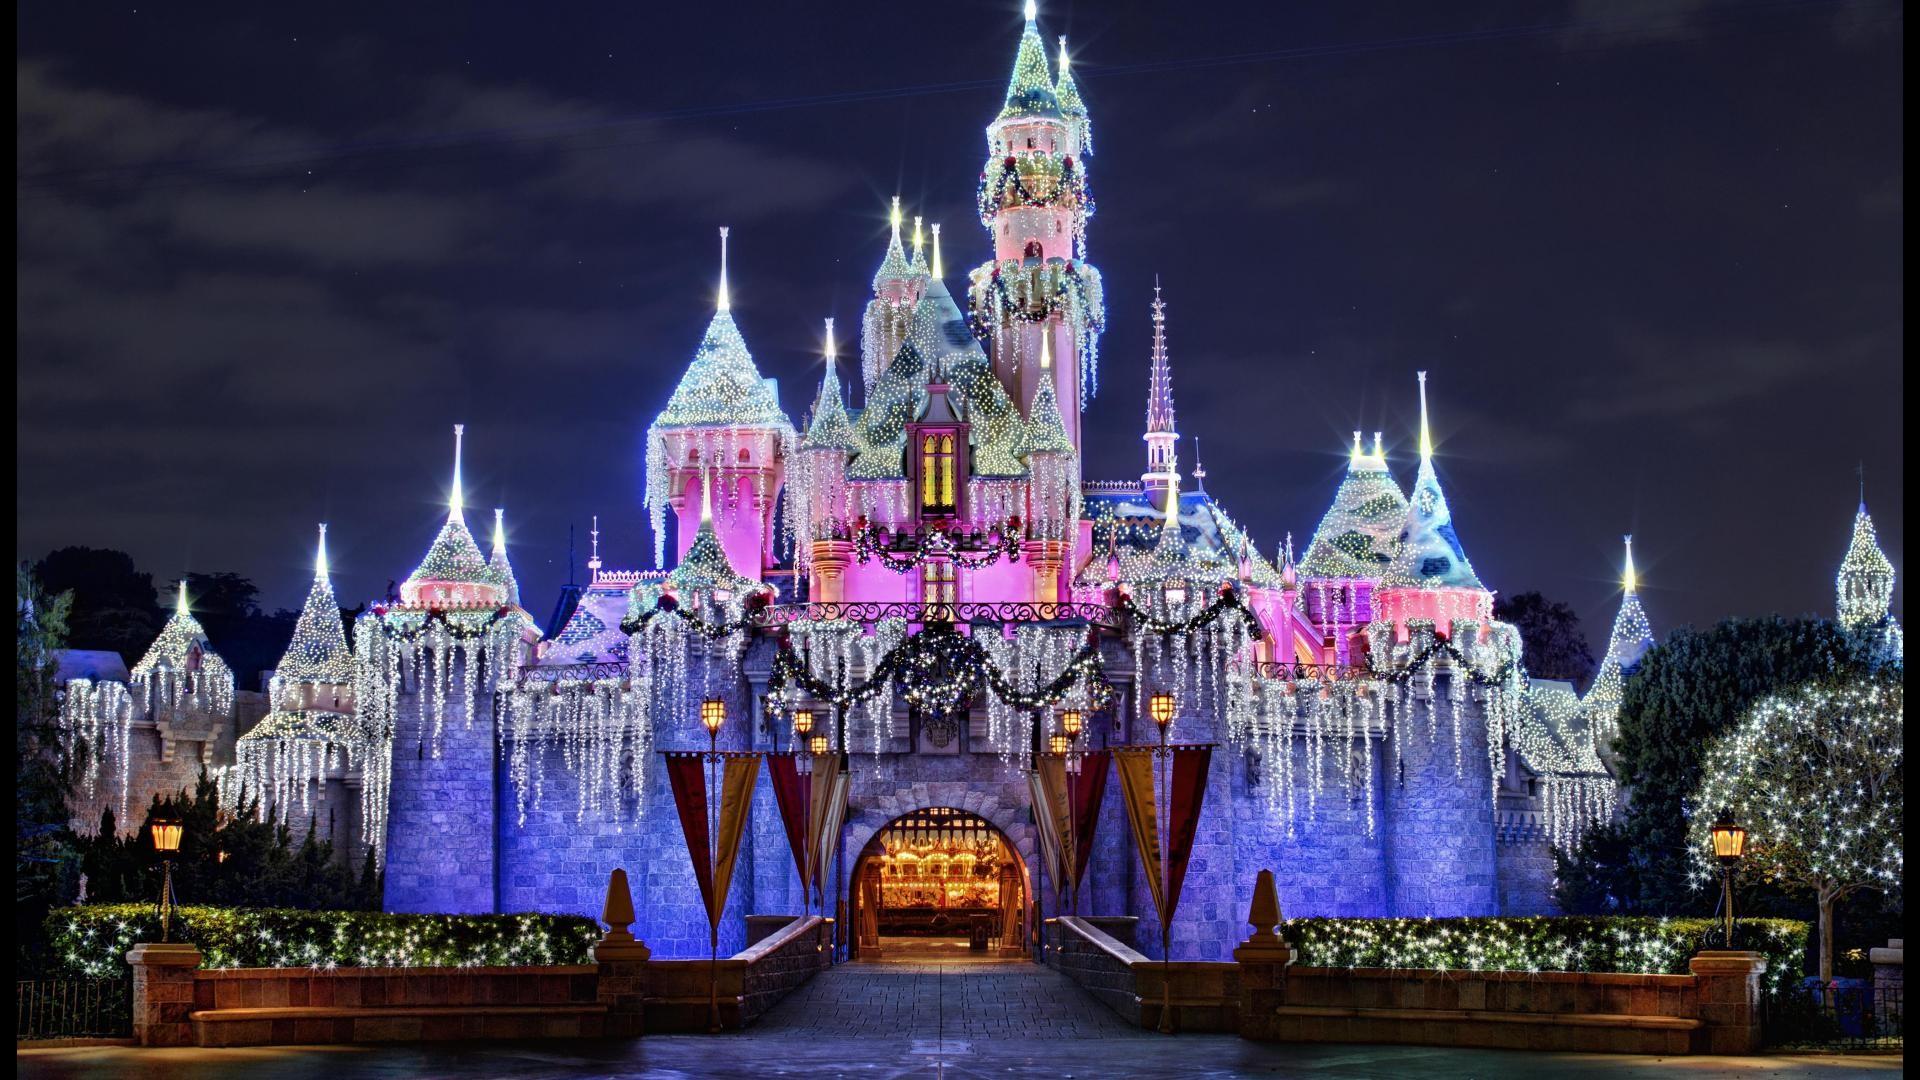 70 Disneyland Castle Wallpapers on WallpaperPlay